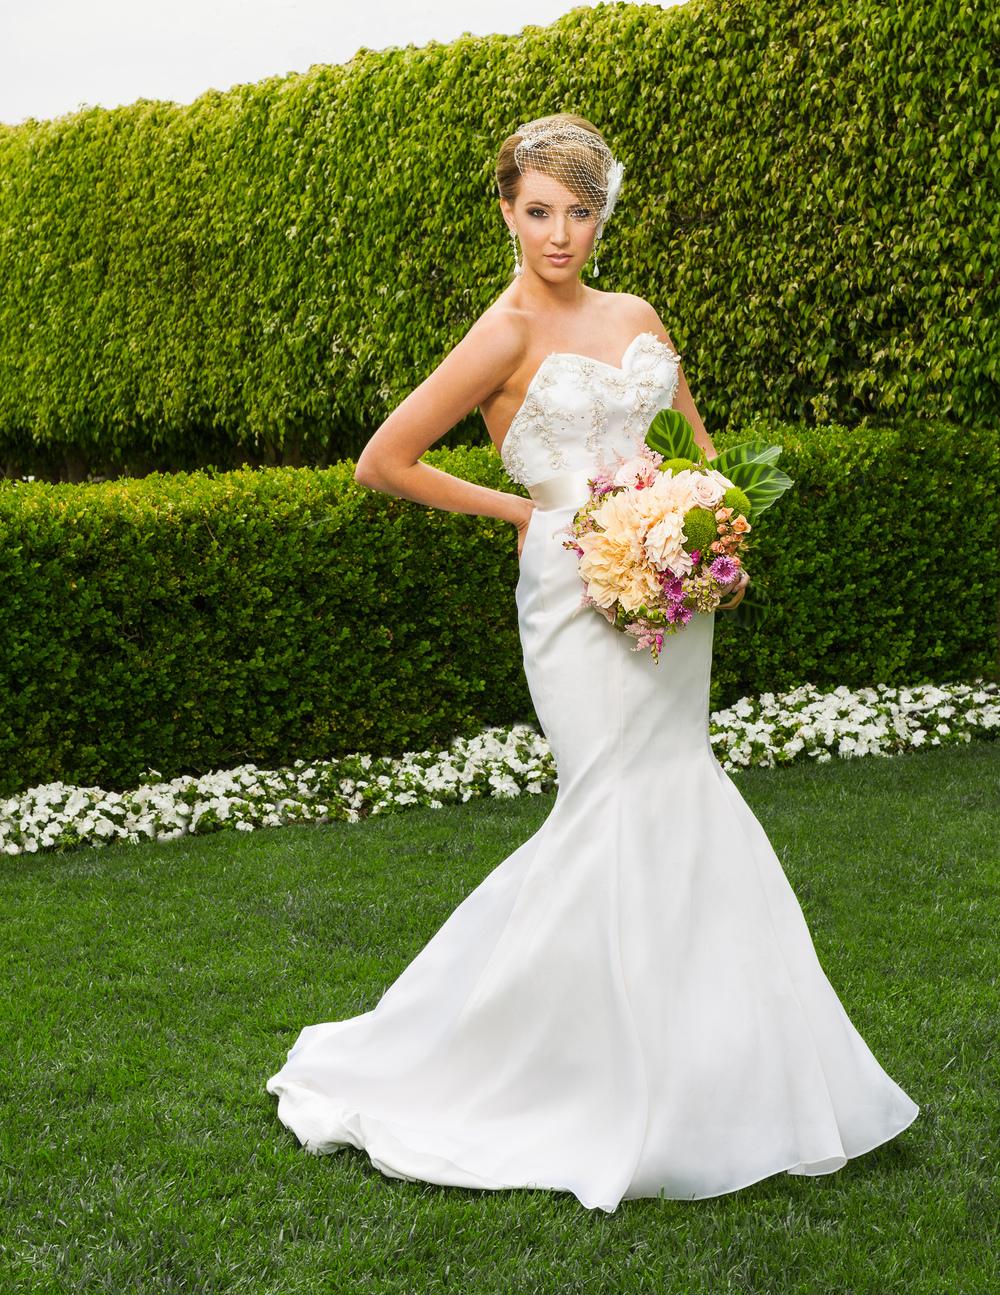 stewart_bertrand_wedding_photography_sdsw13-1008.jpg